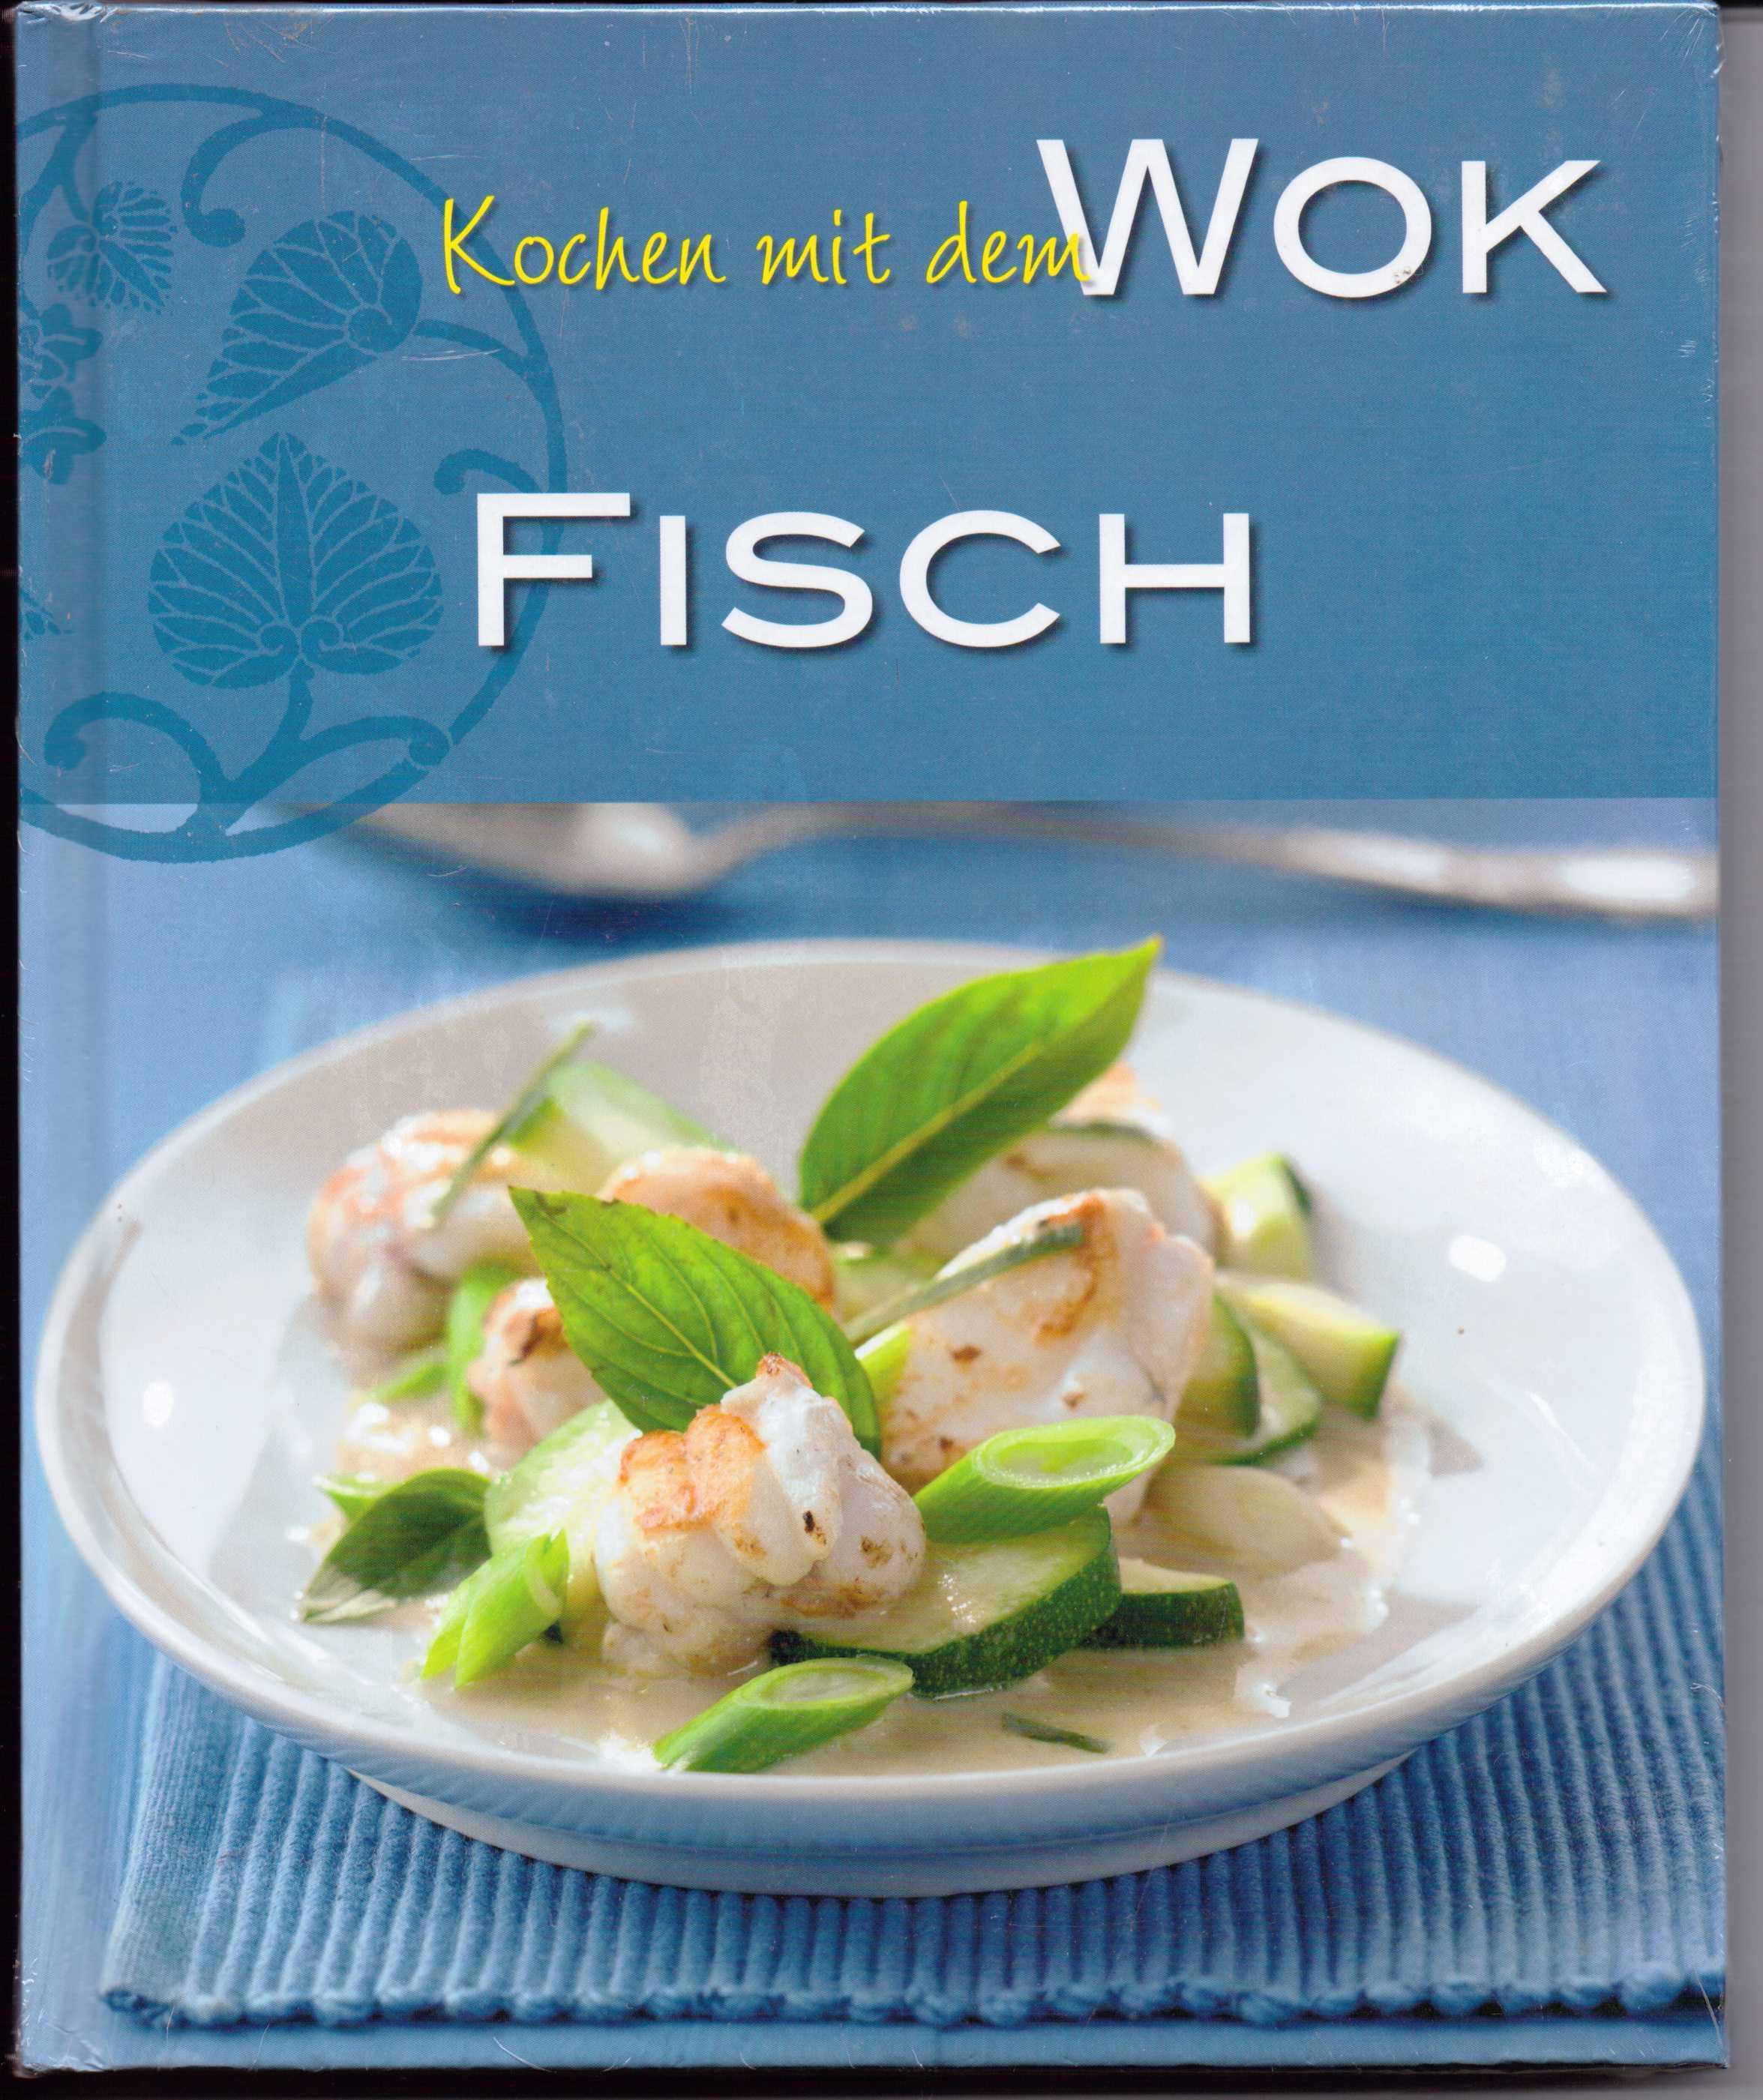 kochen mit dem wok fisch asia food specialities. Black Bedroom Furniture Sets. Home Design Ideas